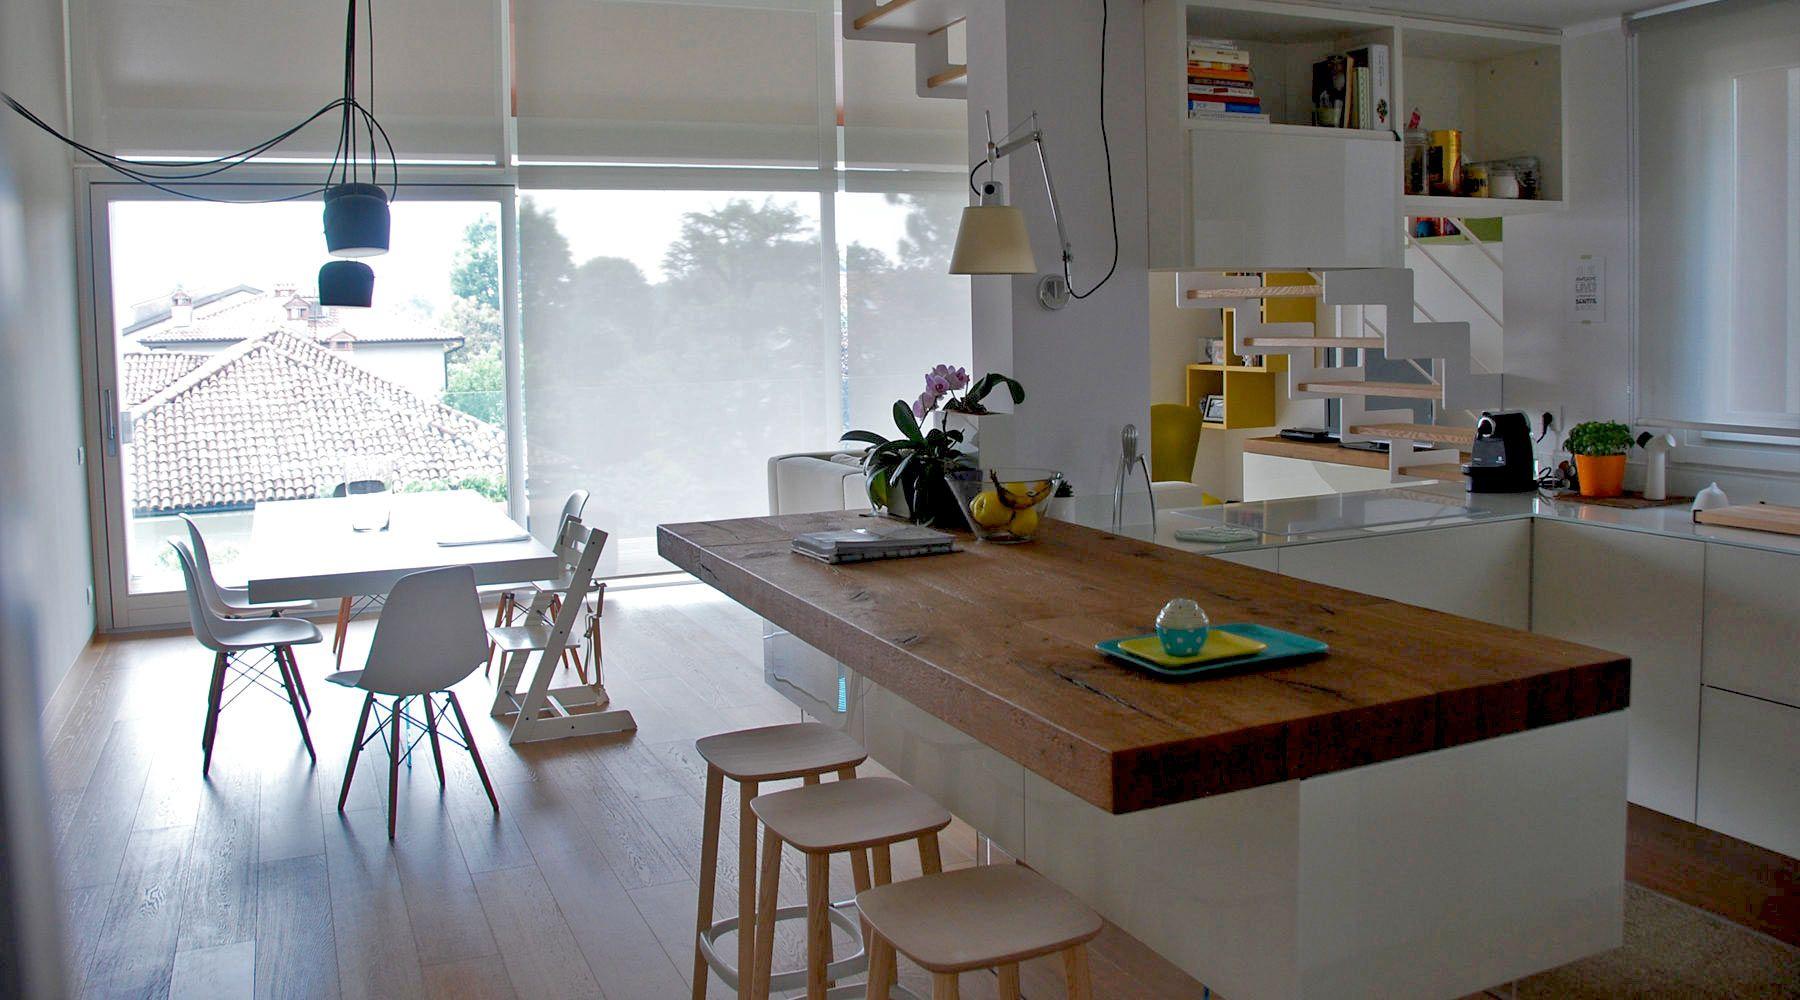 Appartamento Lago Vimercate | Cucine | Cucine, Isola cucina e ...